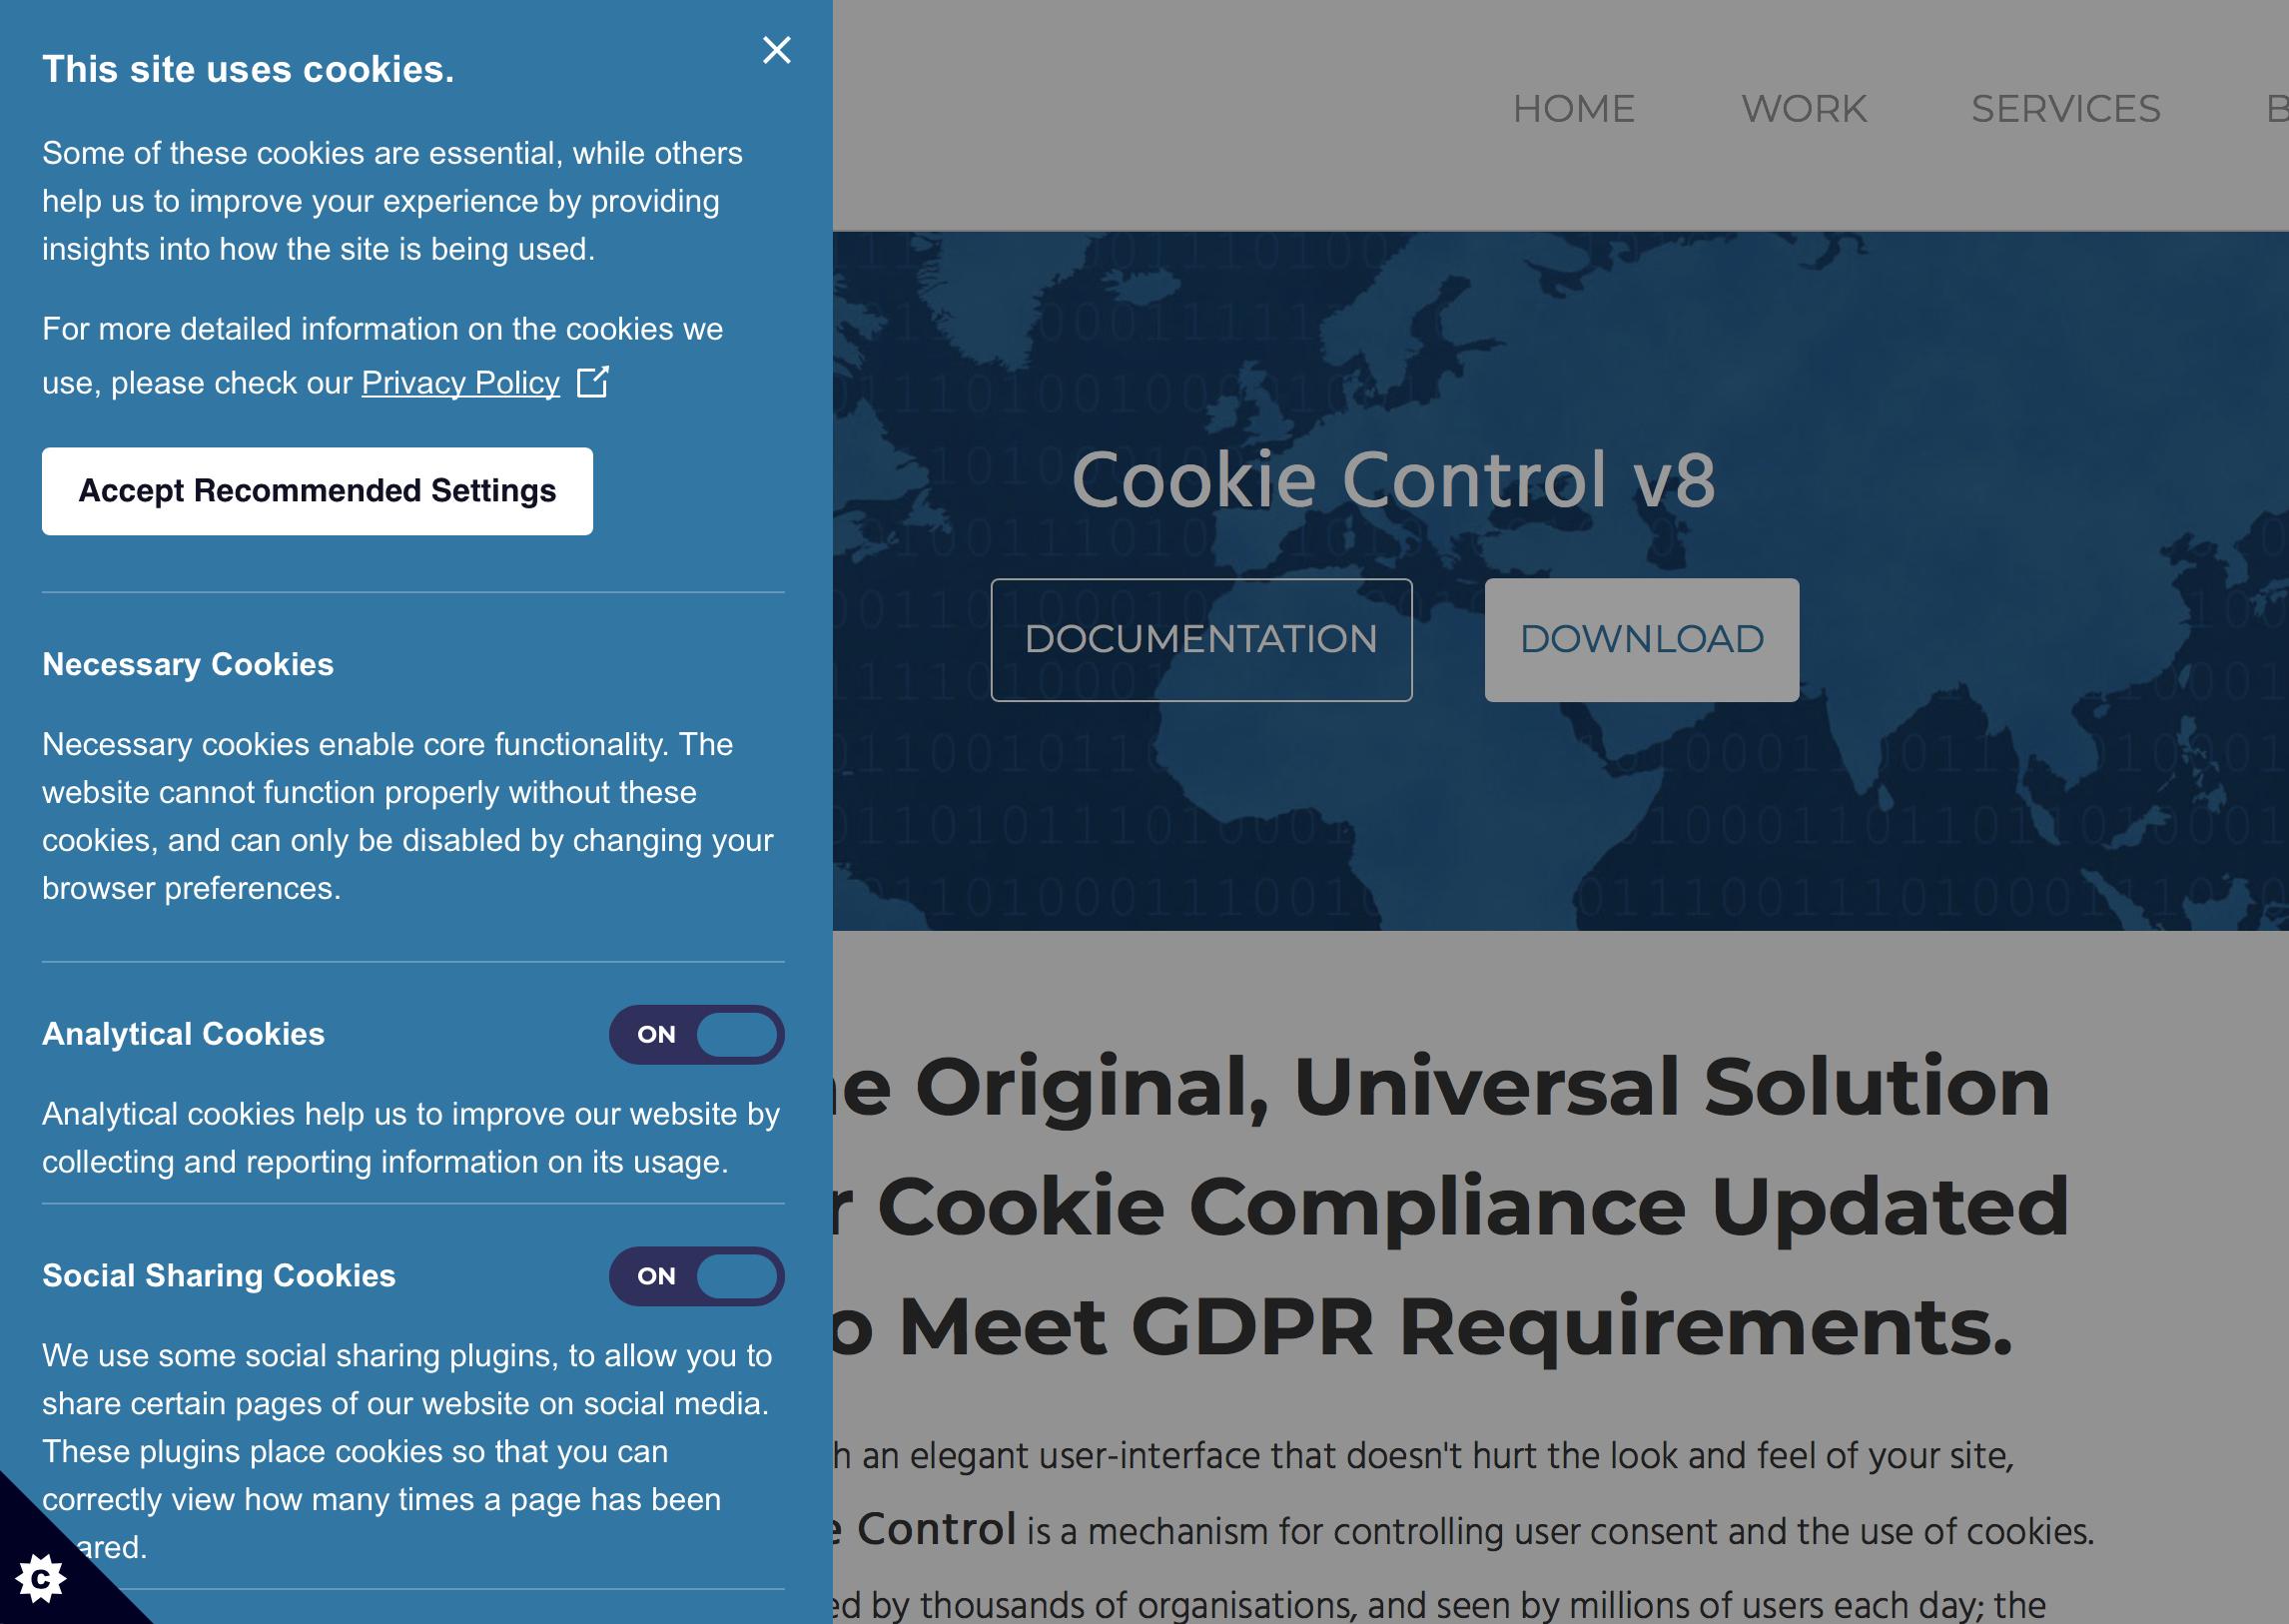 gdpr cookies form 3